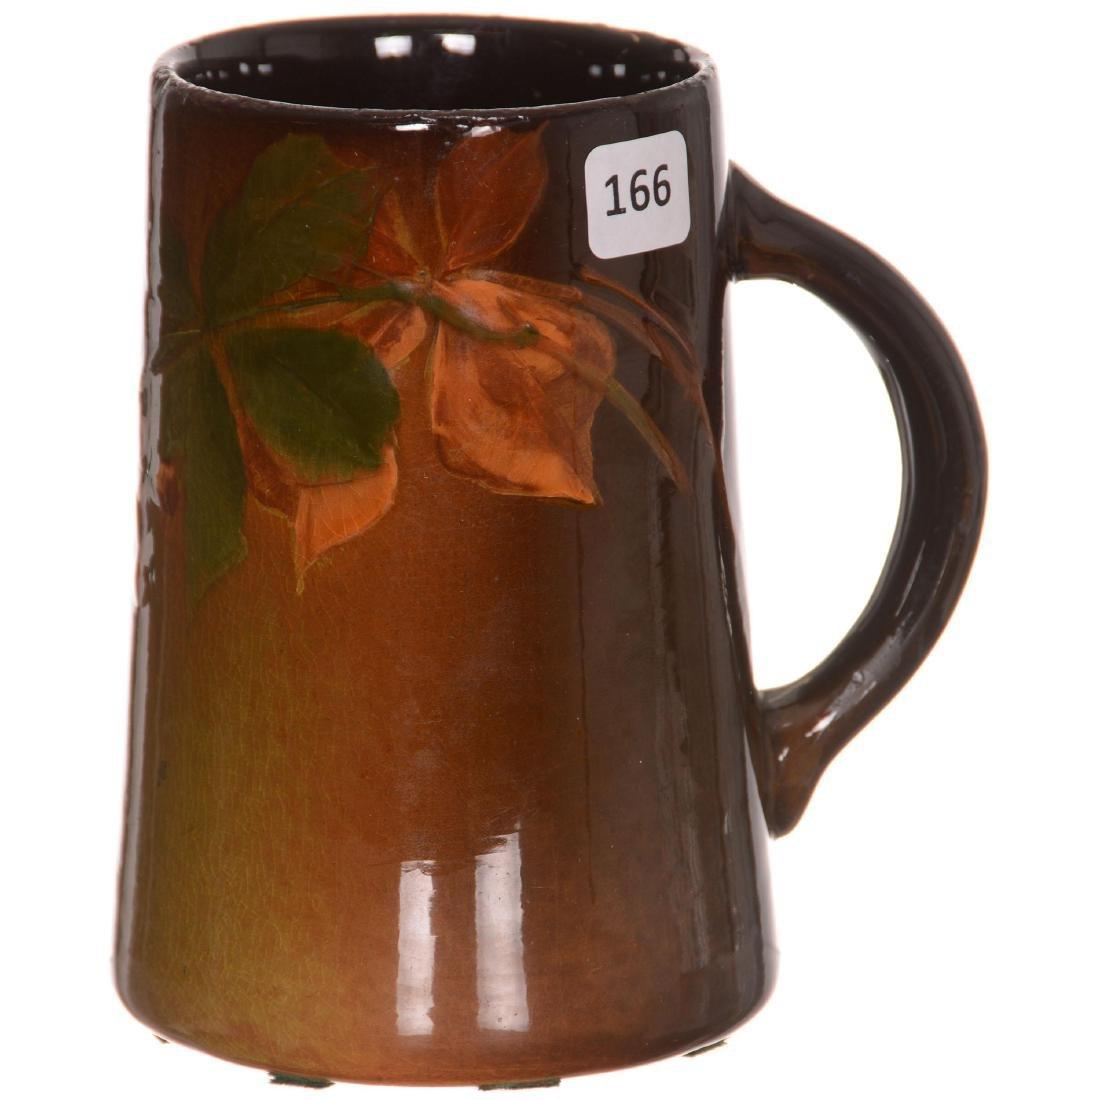 Weller Louwelsa Art Pottery Mug